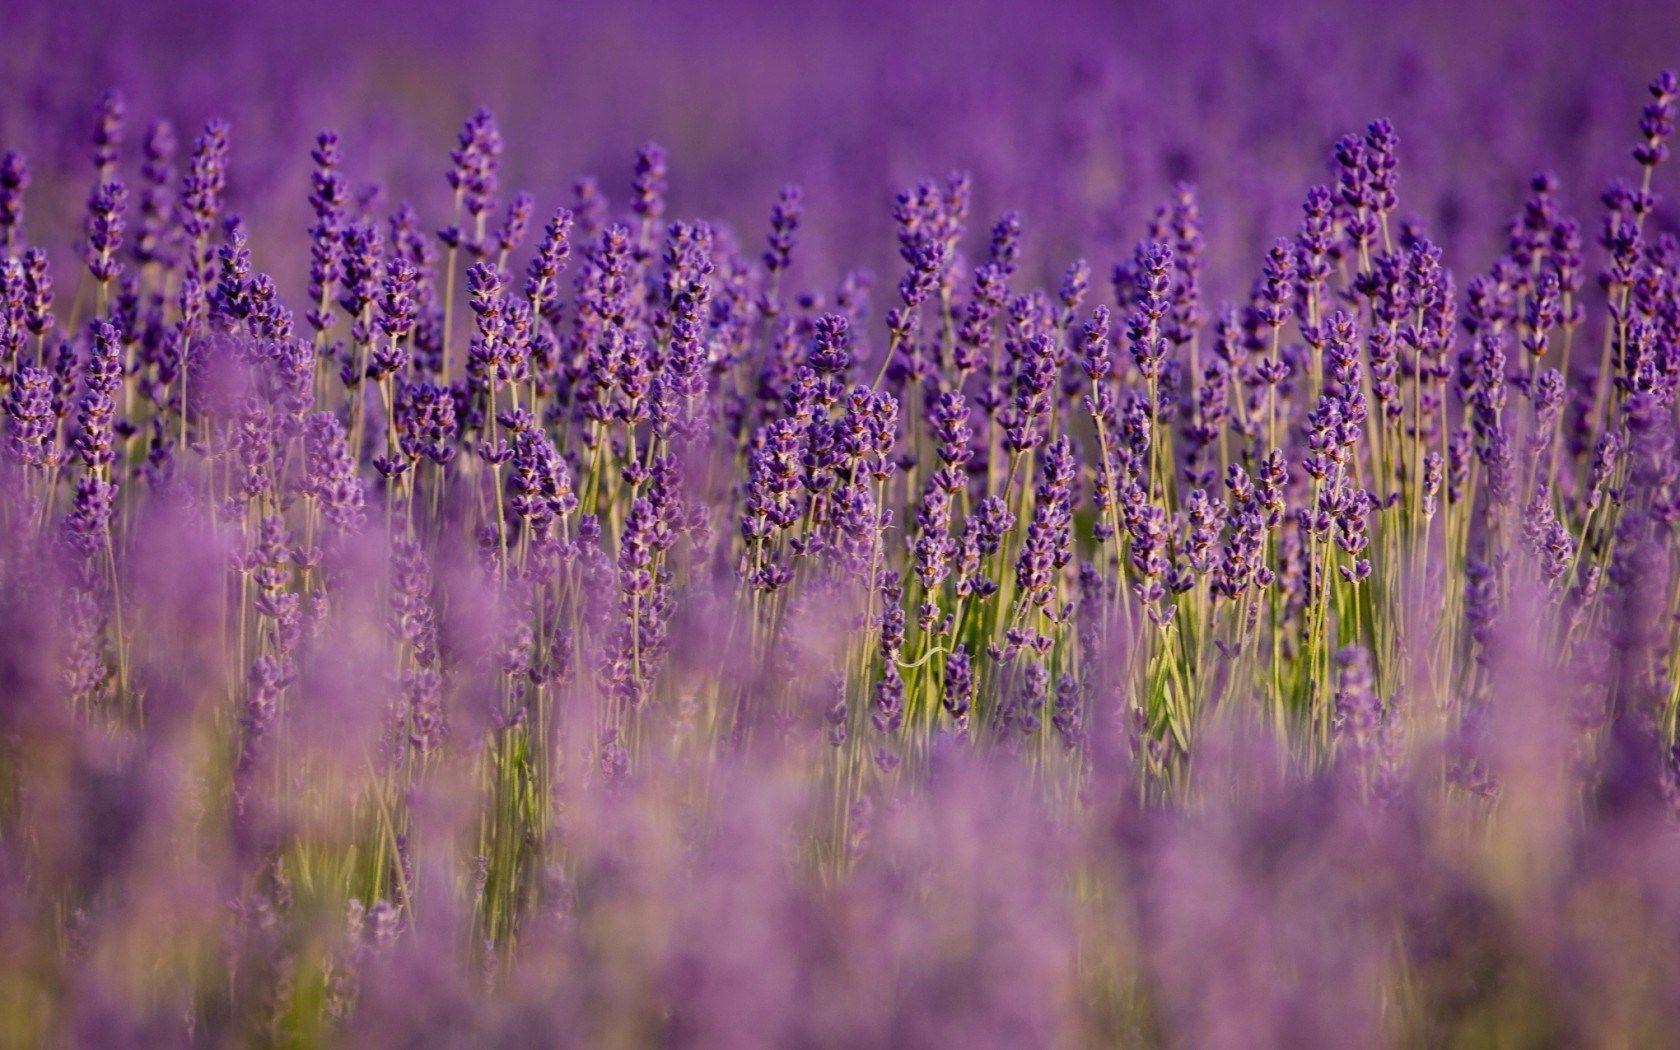 Lavender Flower Wallpapers - Wallpaper Cave